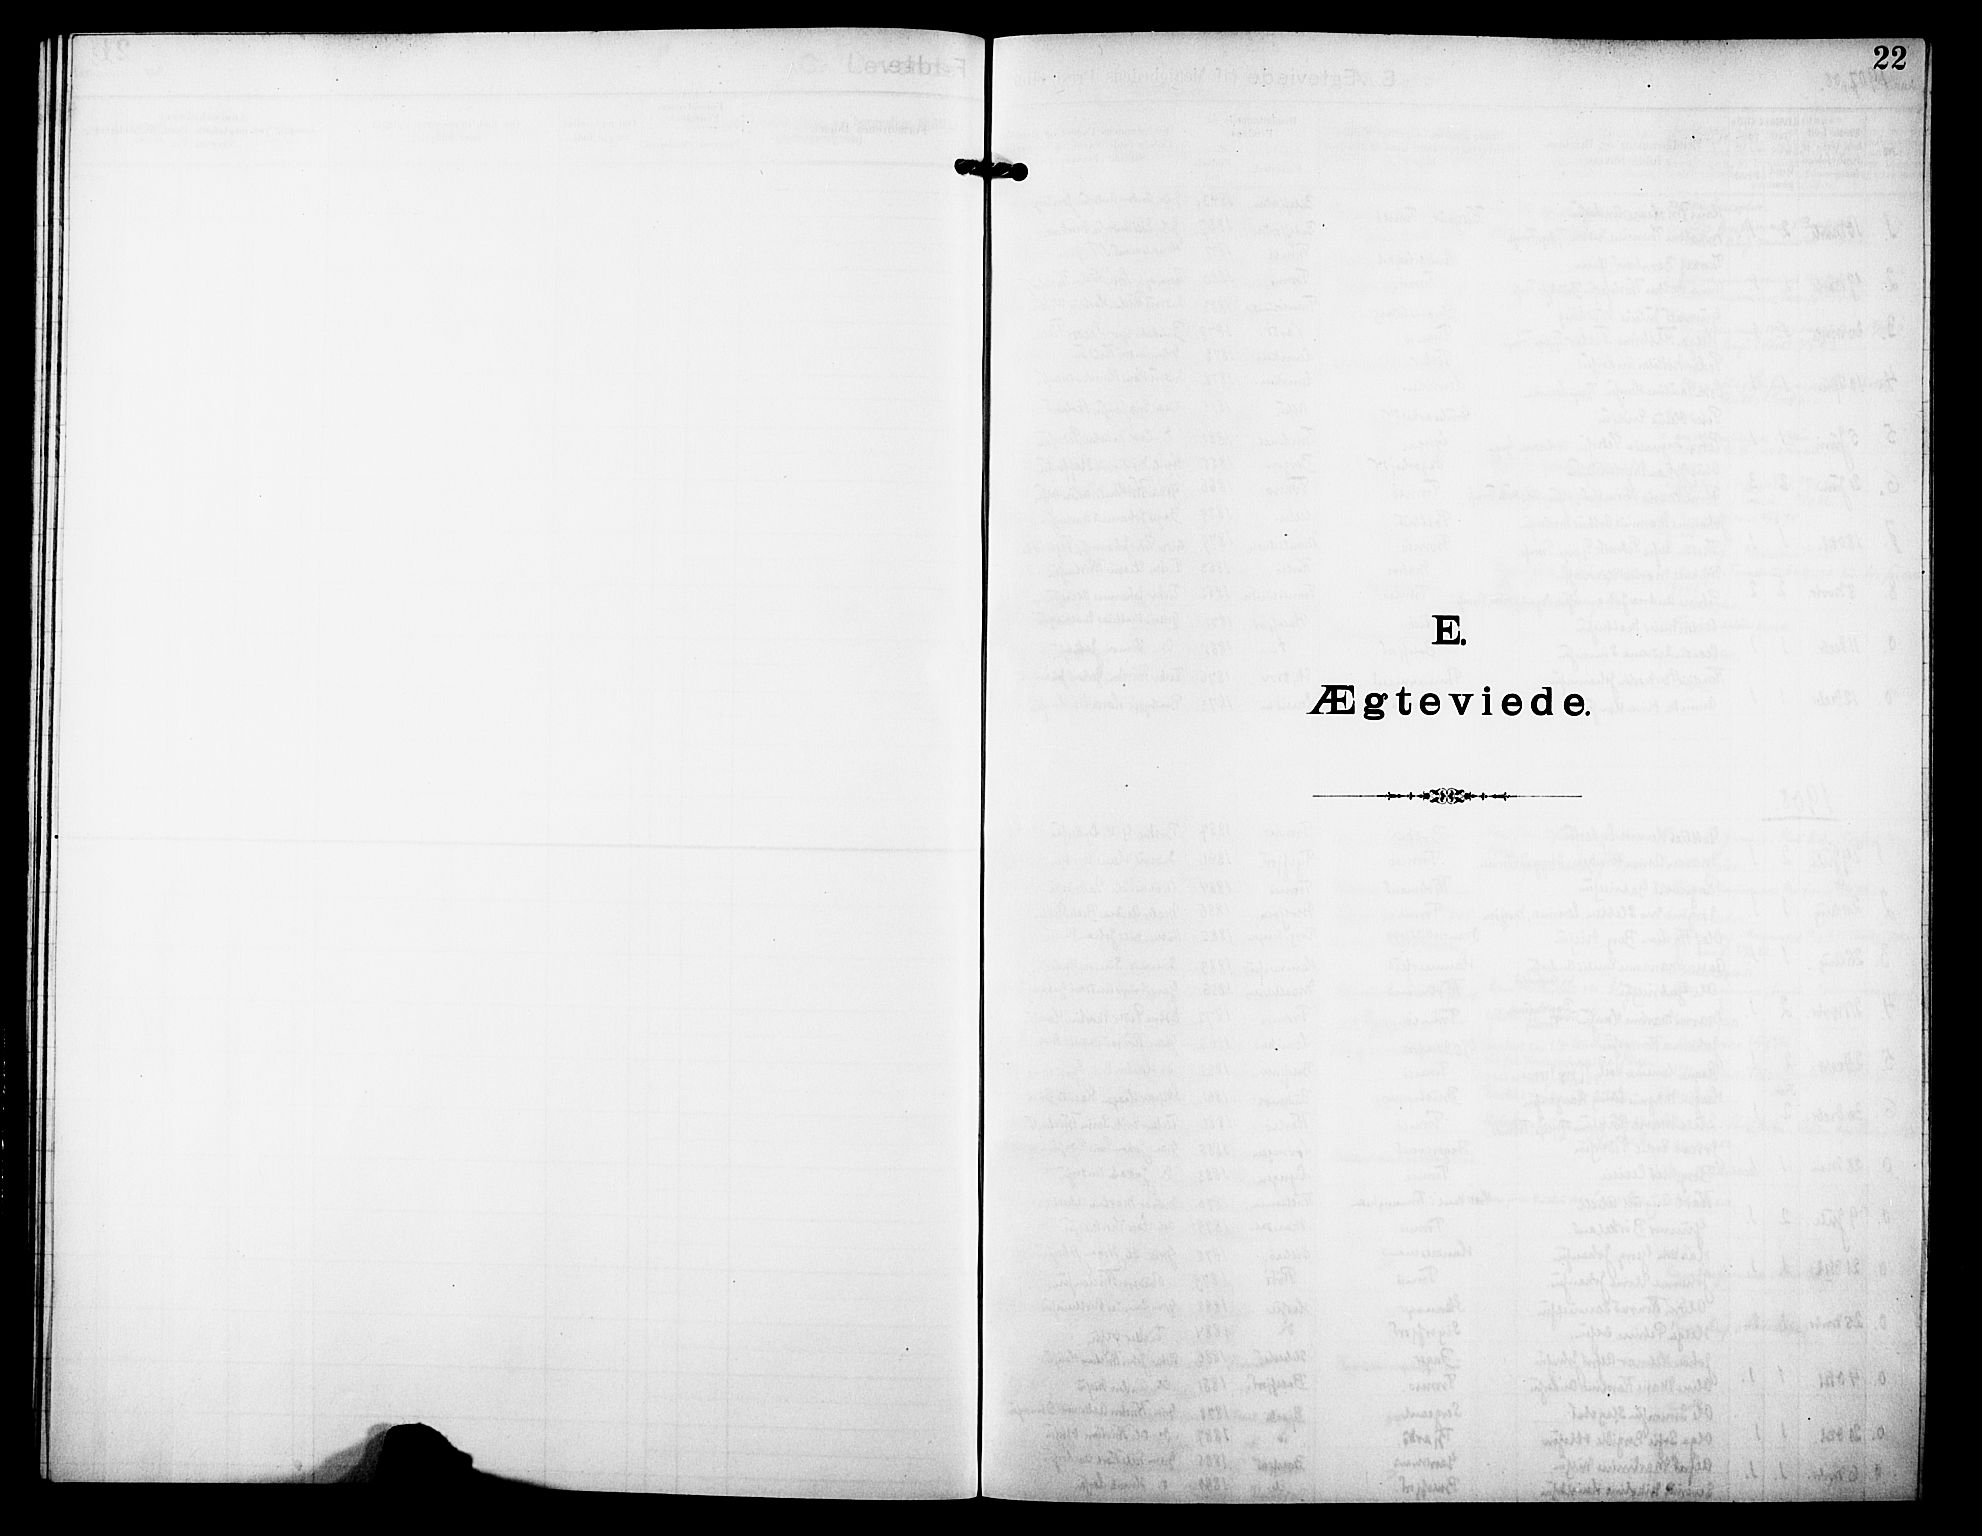 SATØ, Tromsø sokneprestkontor/stiftsprosti/domprosti, G/Ge/L0068: Dissenterprotokoll nr. 68, 1907-1917, s. 22